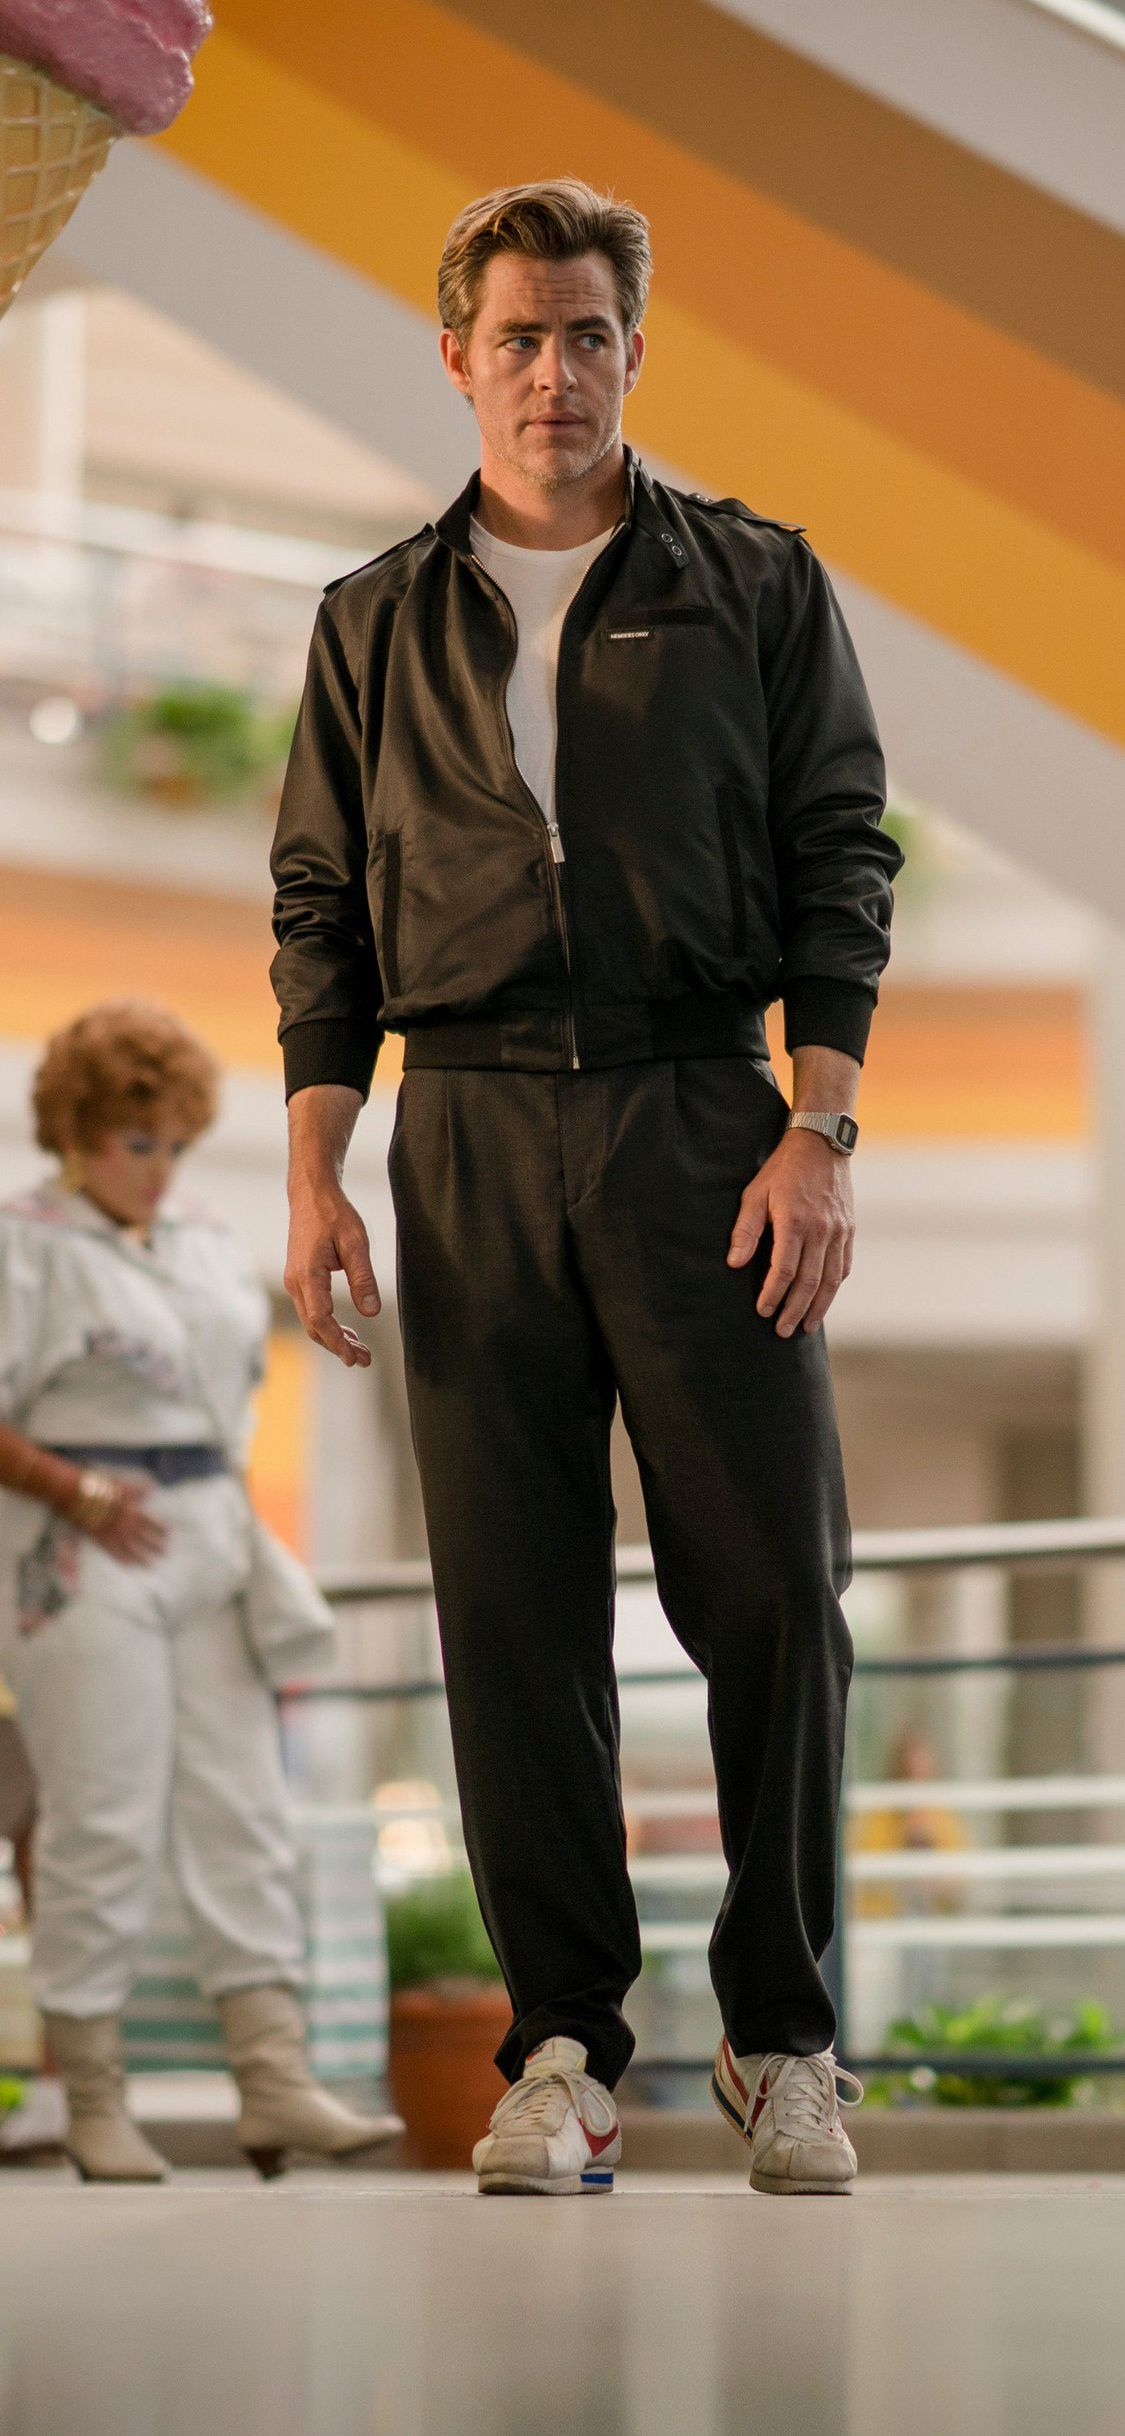 Chris Pine As Steve Trevor Wonder Woman 1984 In 1125x2436 Resolution In 2020 Chris Pine Steve Trevor Chris Pine Movies